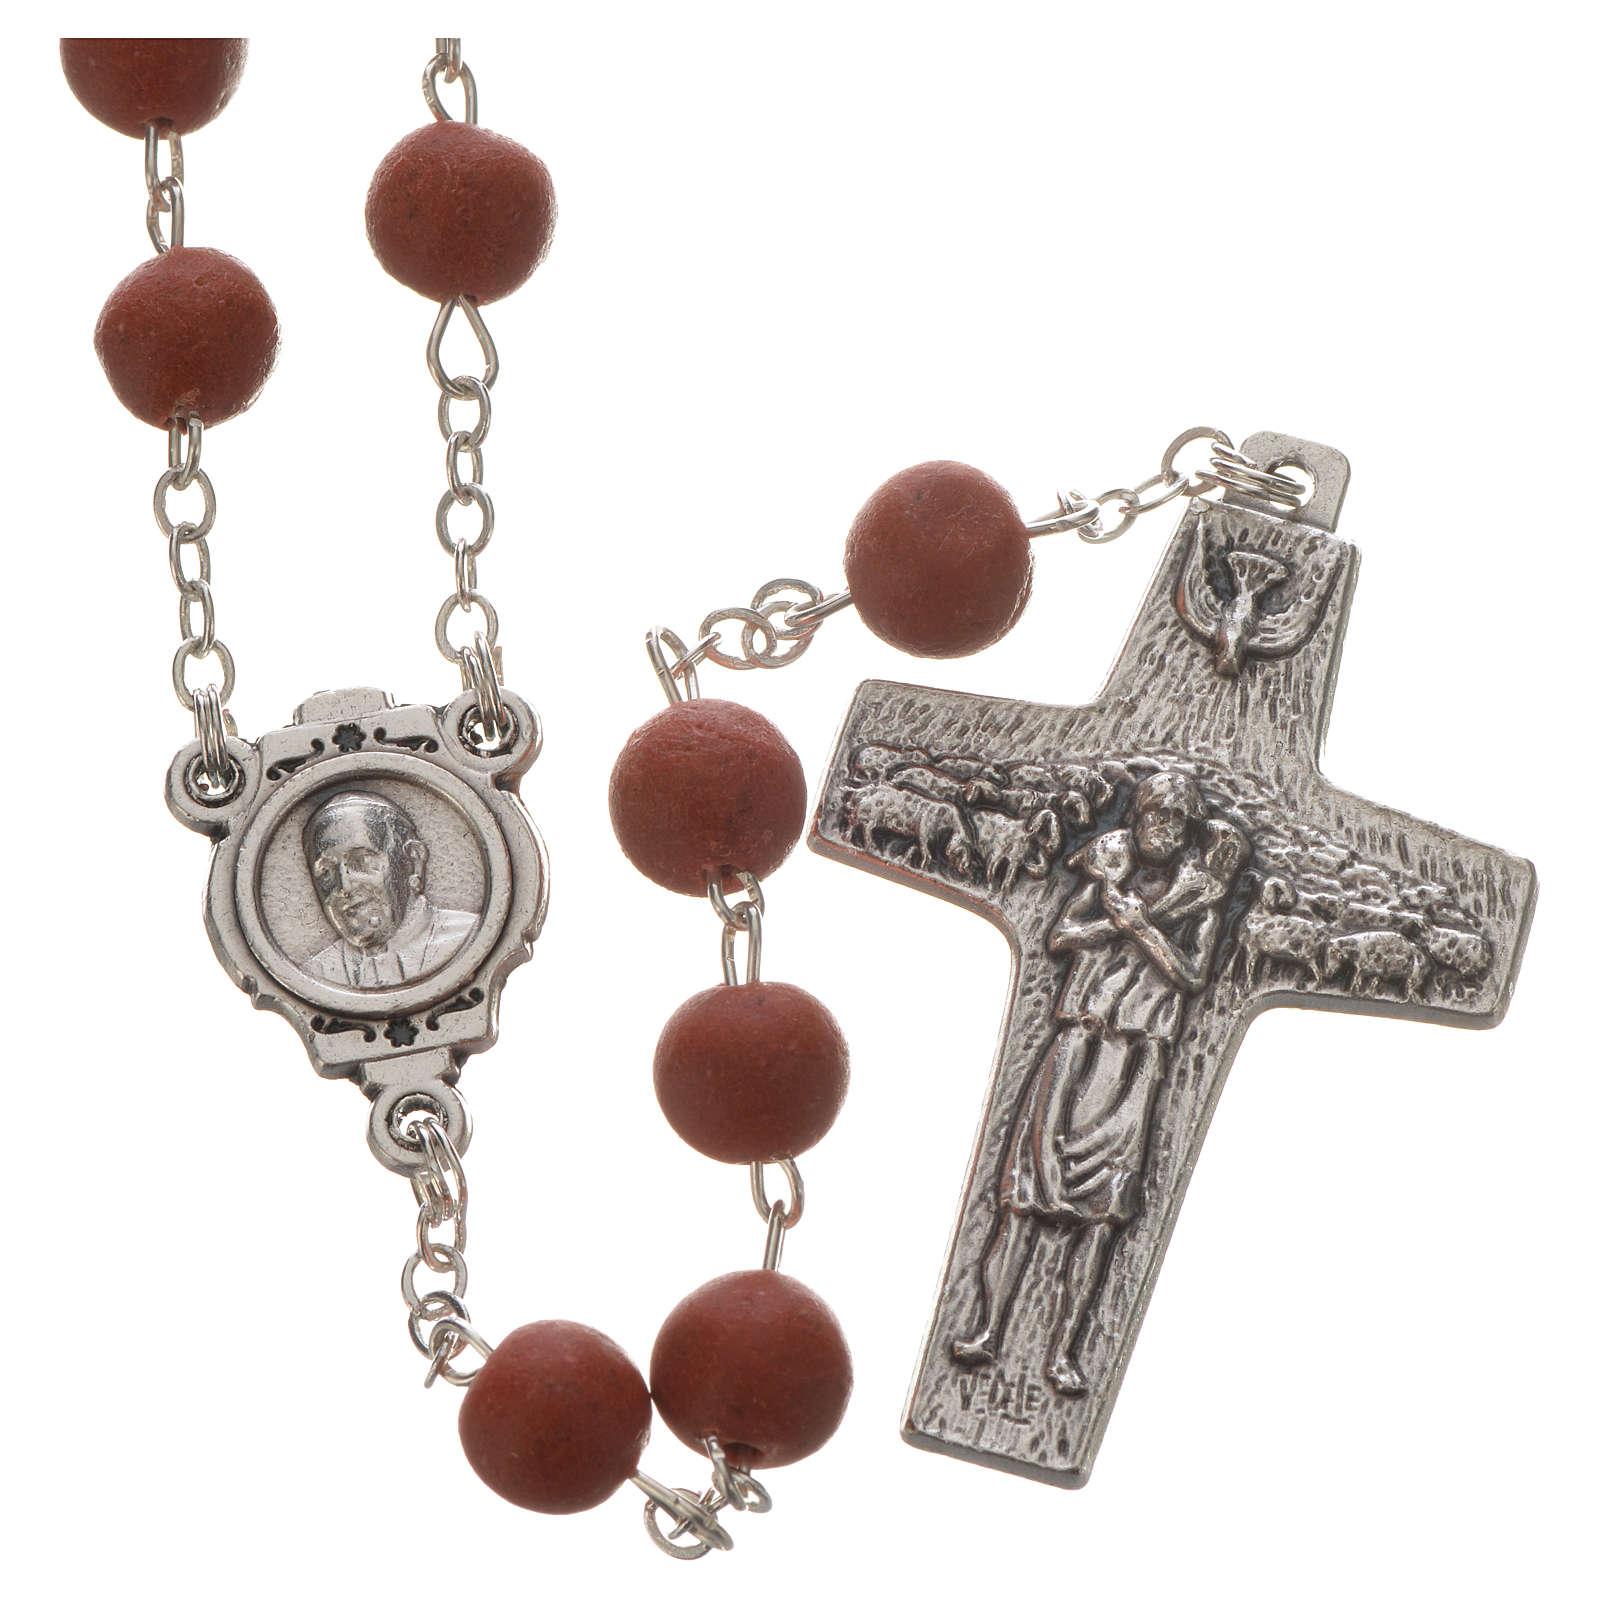 Jasmine perfumed rosary beads, red, Pope Francis 4